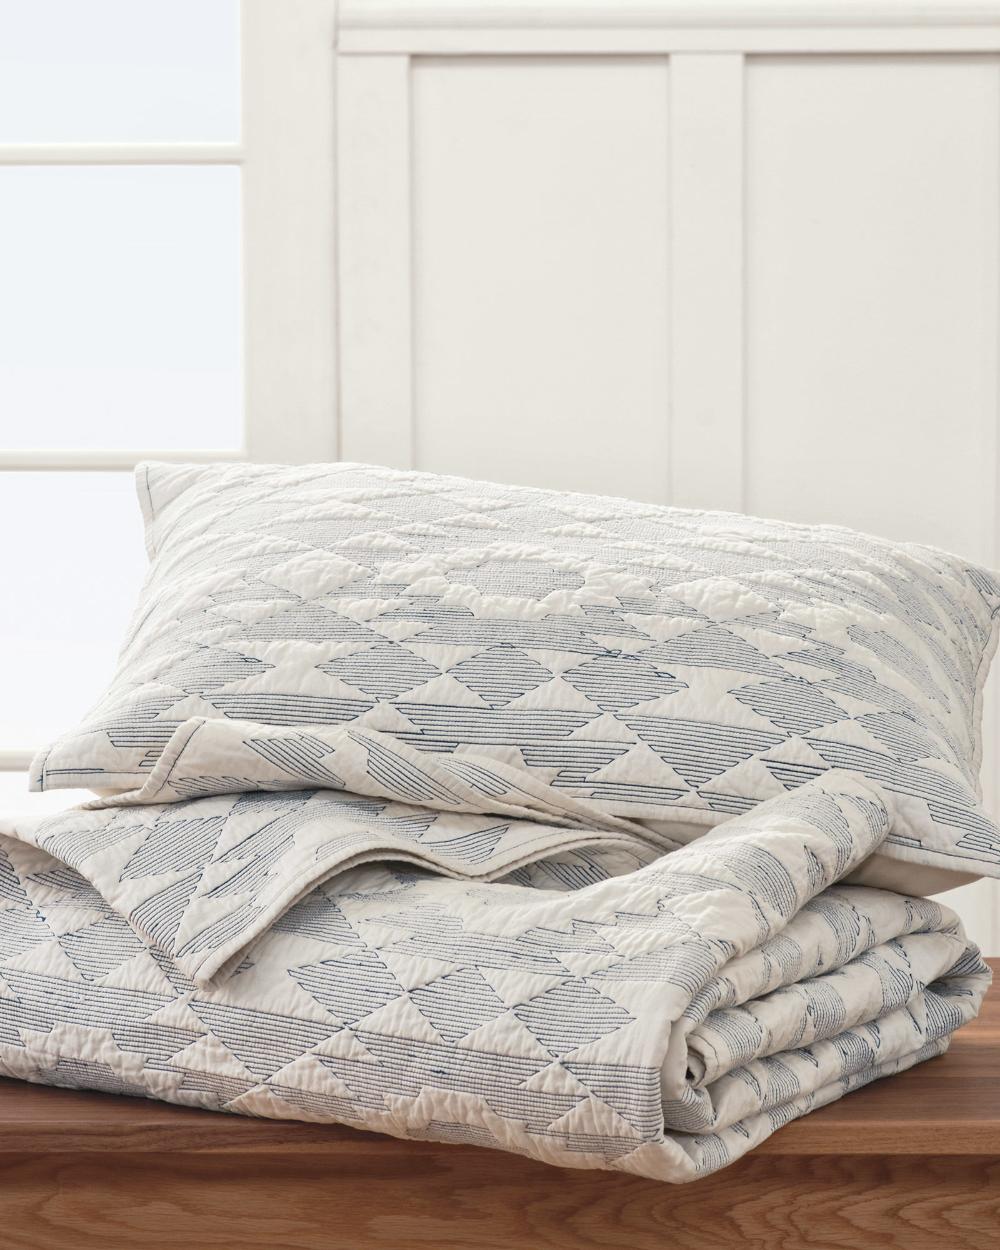 Yuma Star Stitched Quilt Set Pendleton Bedding Sets Master Bedroom Quilts Master Bedroom Quilt Sets